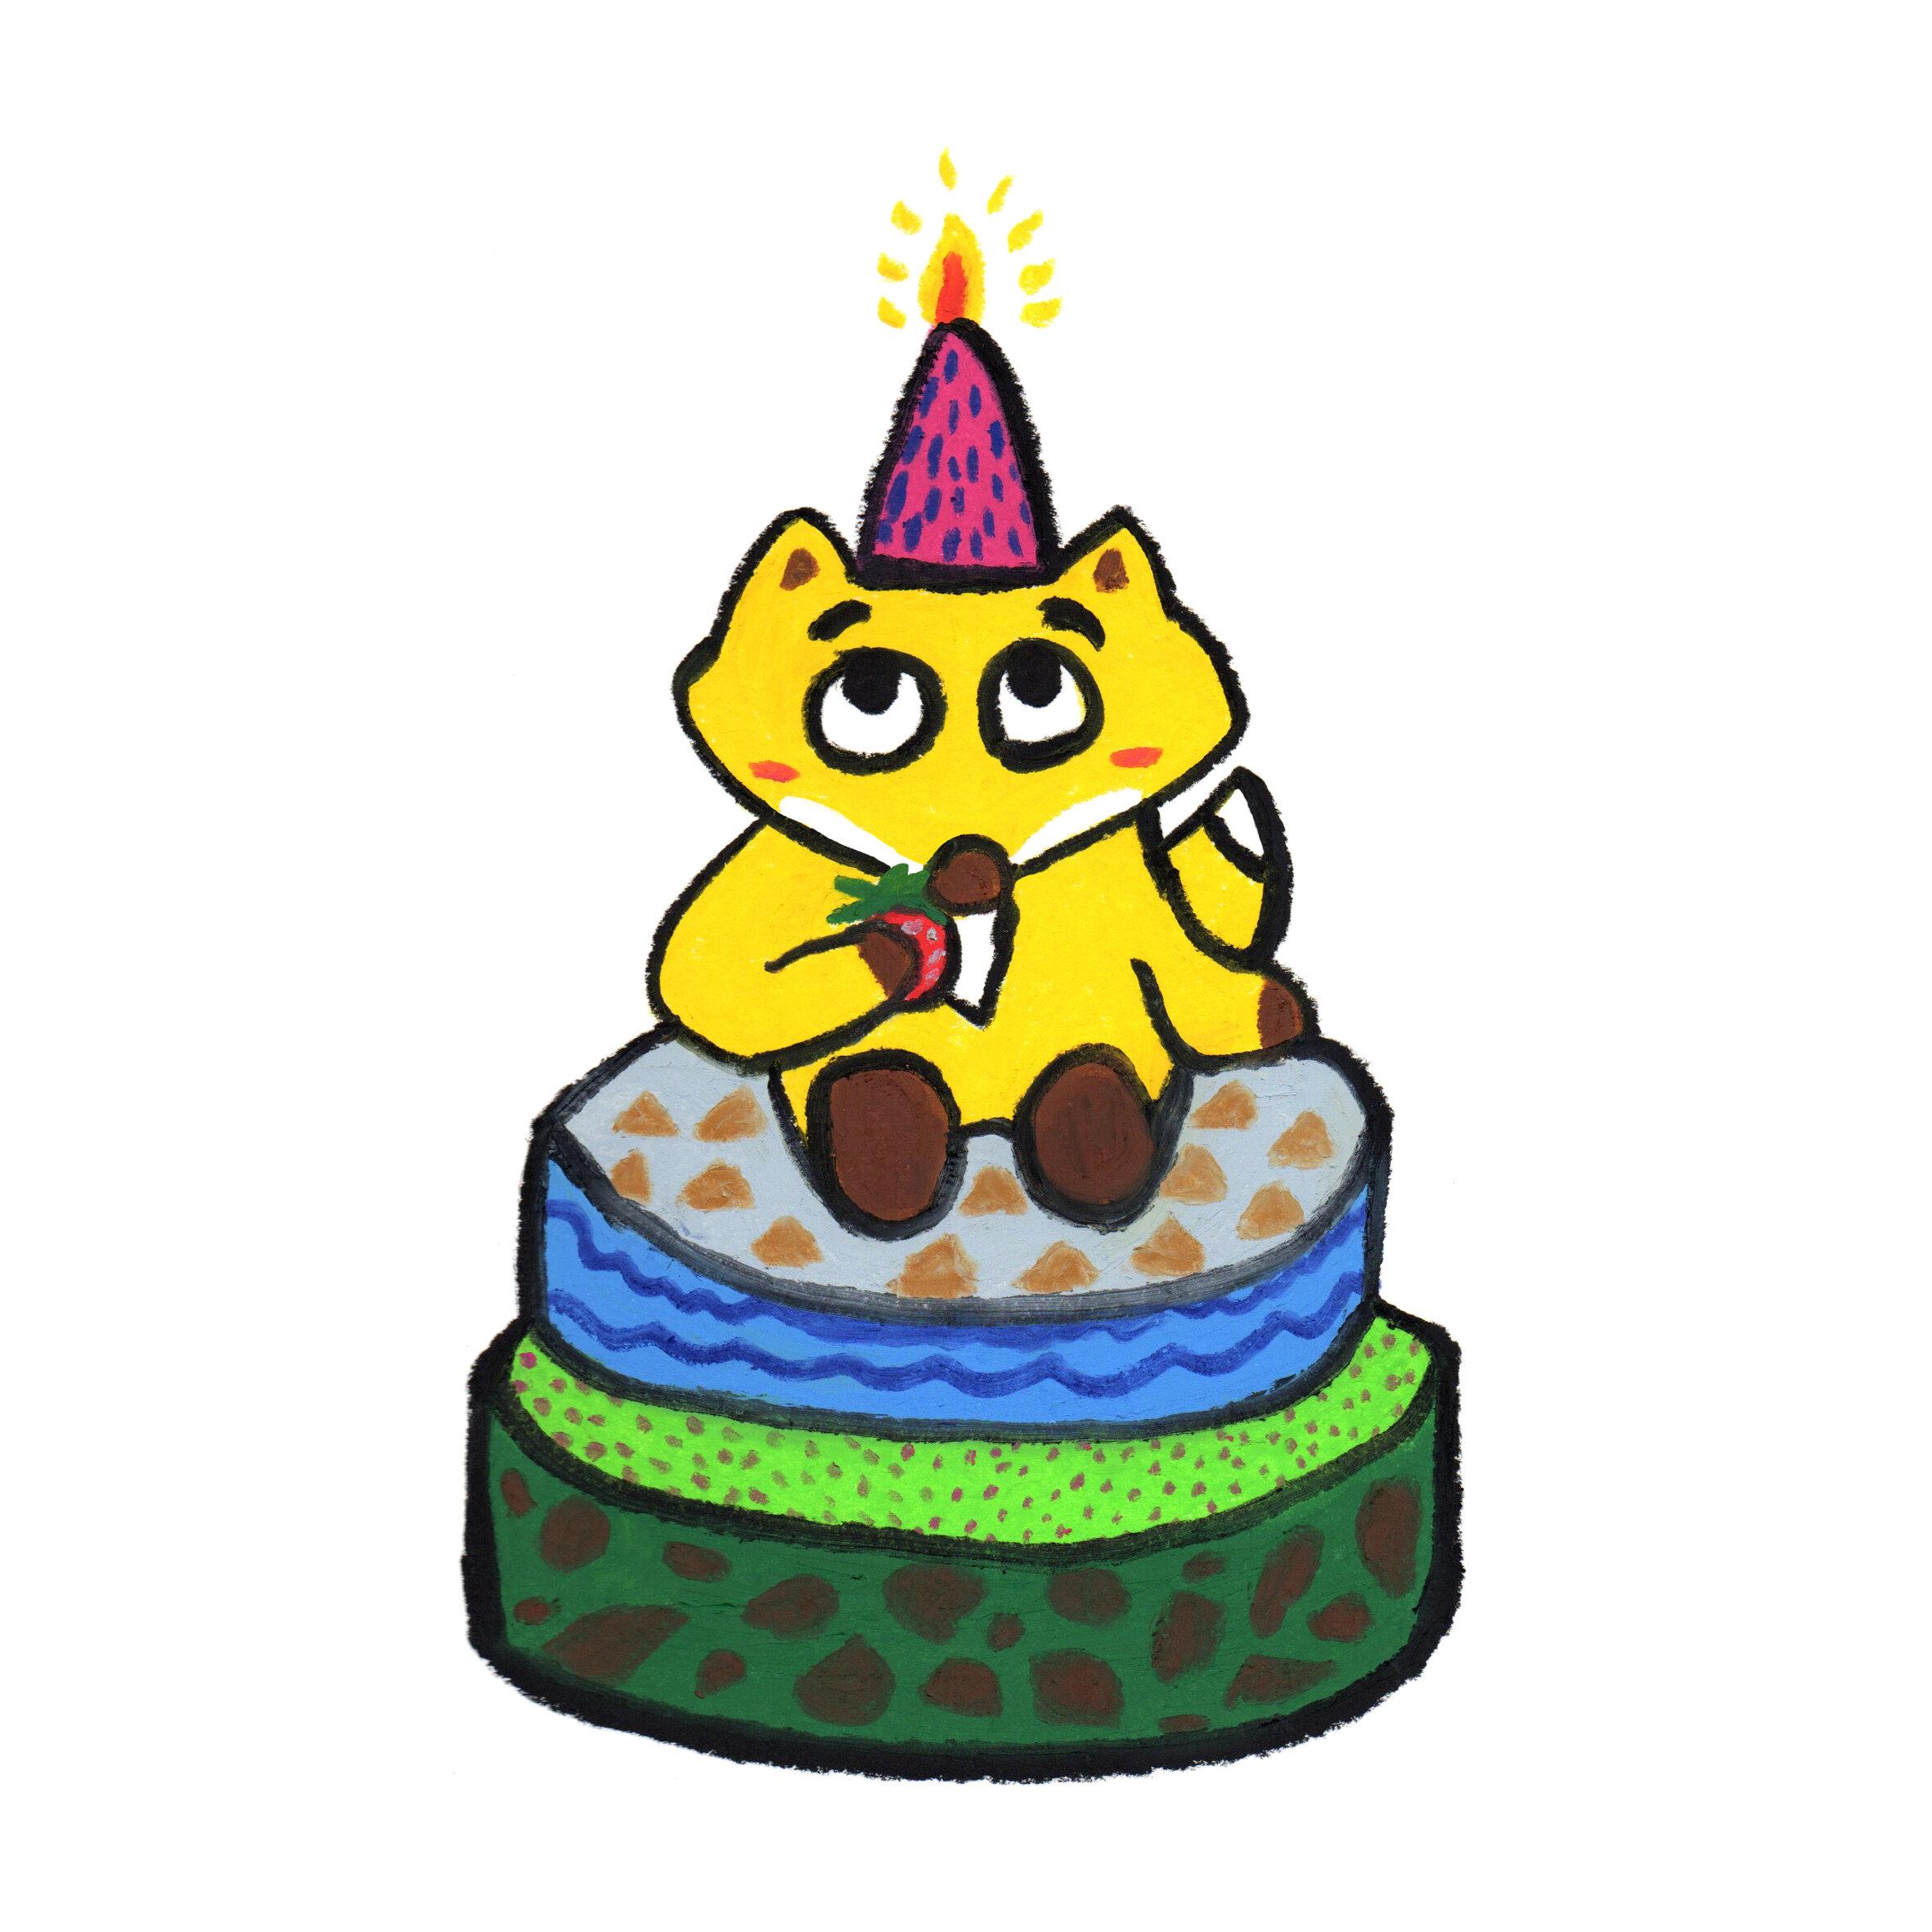 happy birthday 28 years old.jpg